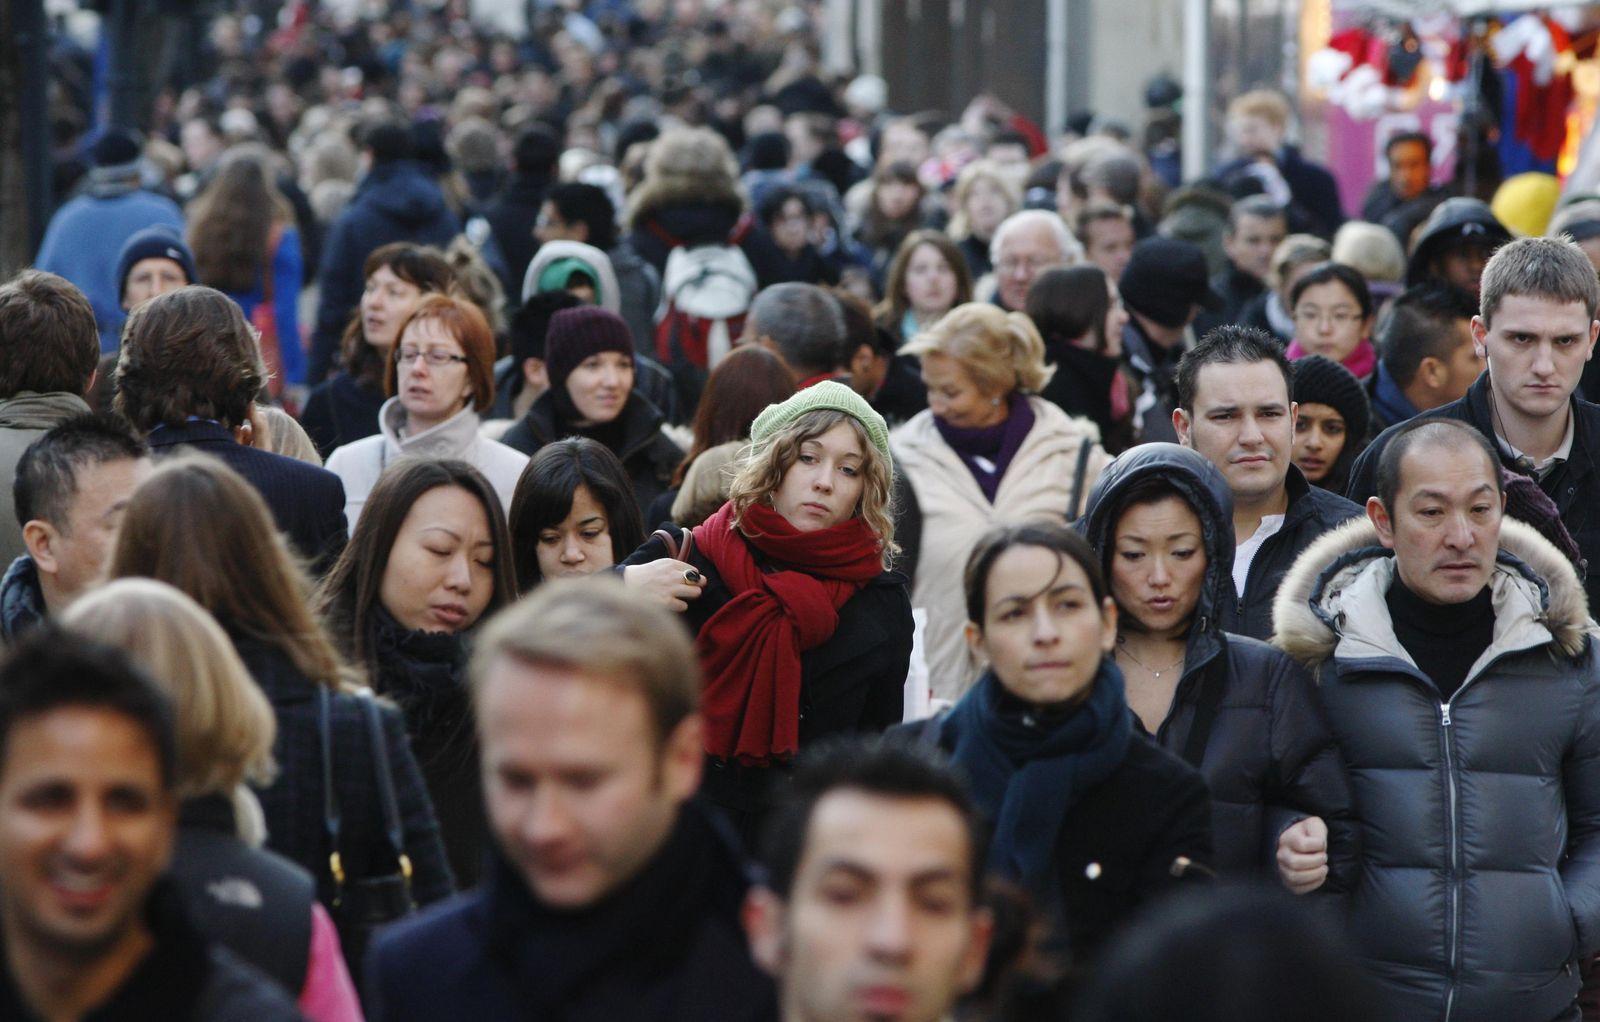 Netzwerkforschung/ Menschenmenge